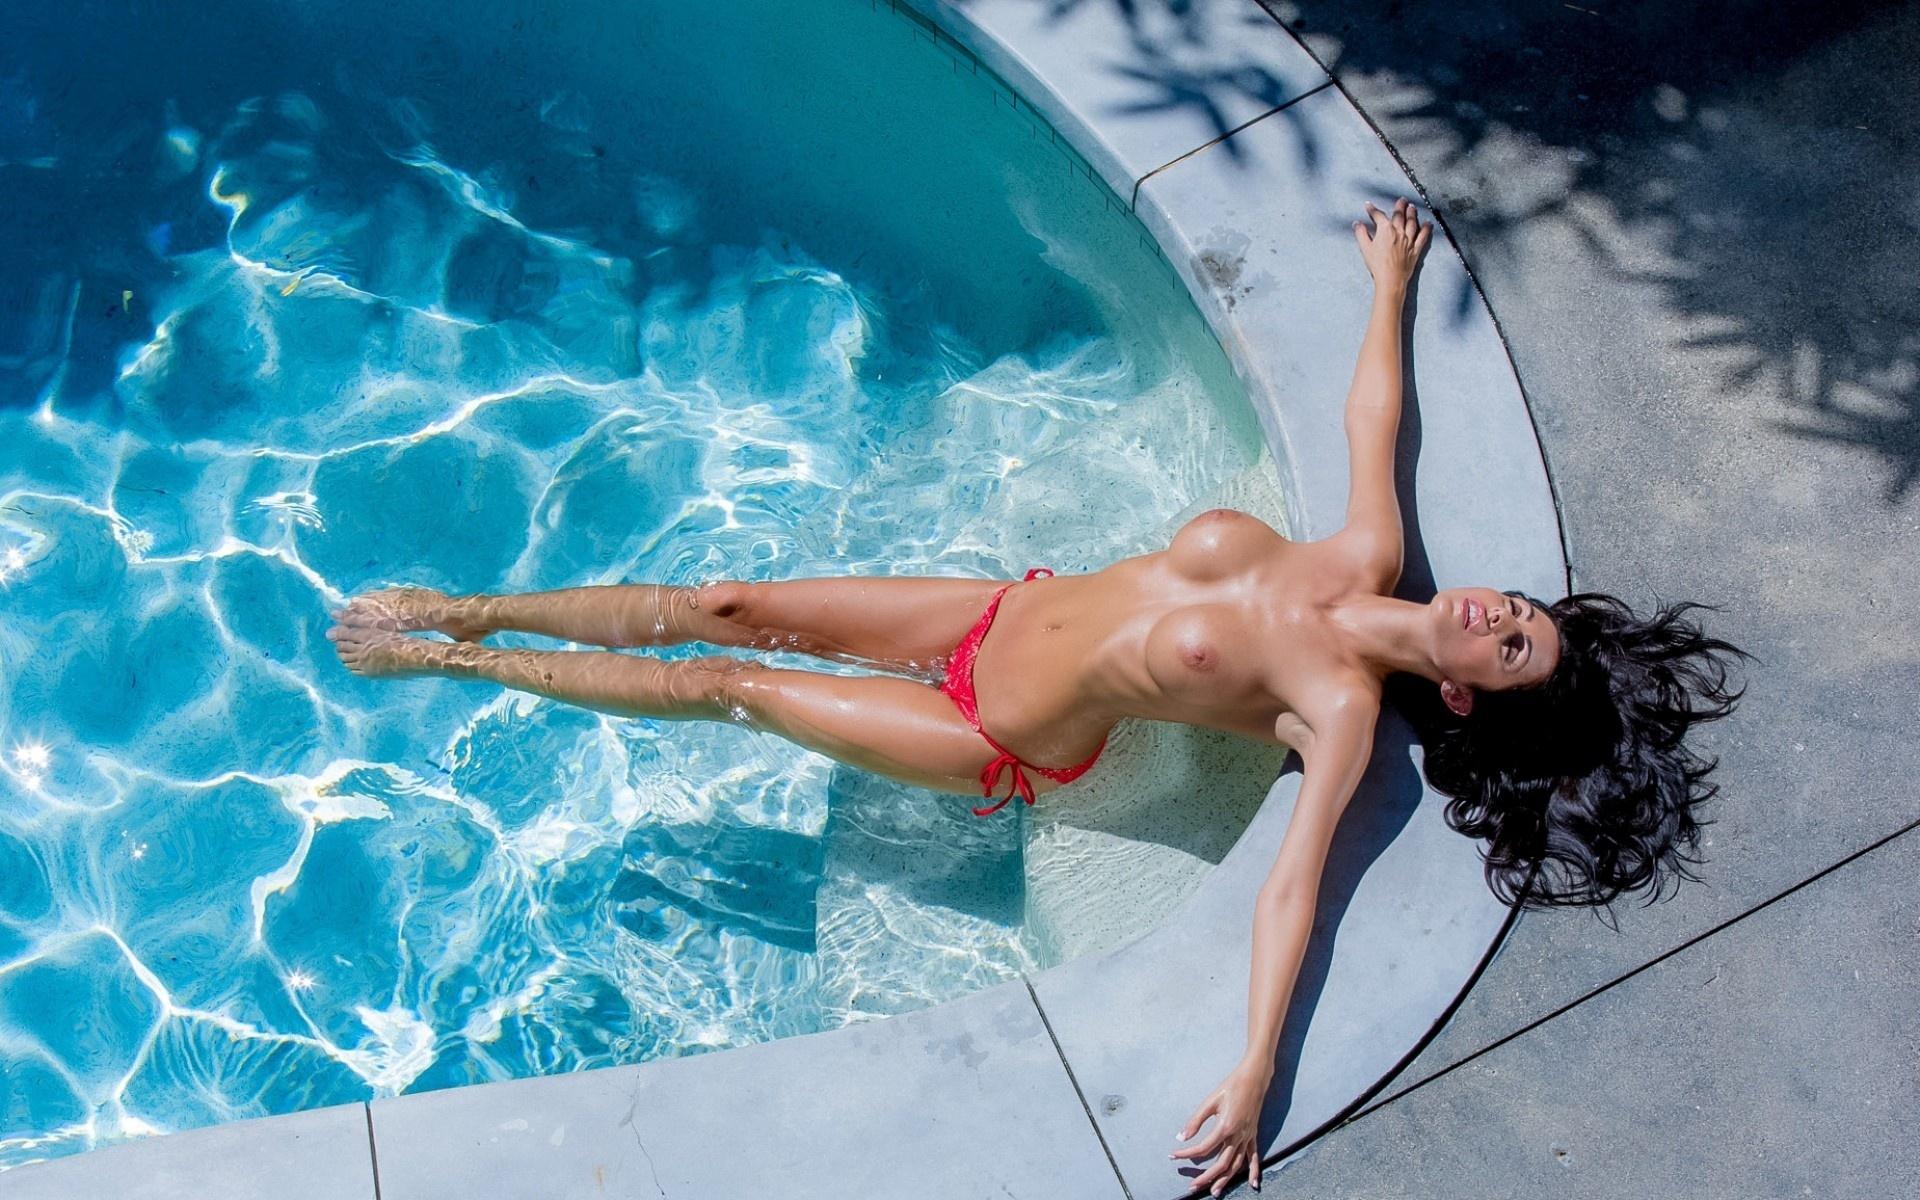 Break naked pool spring